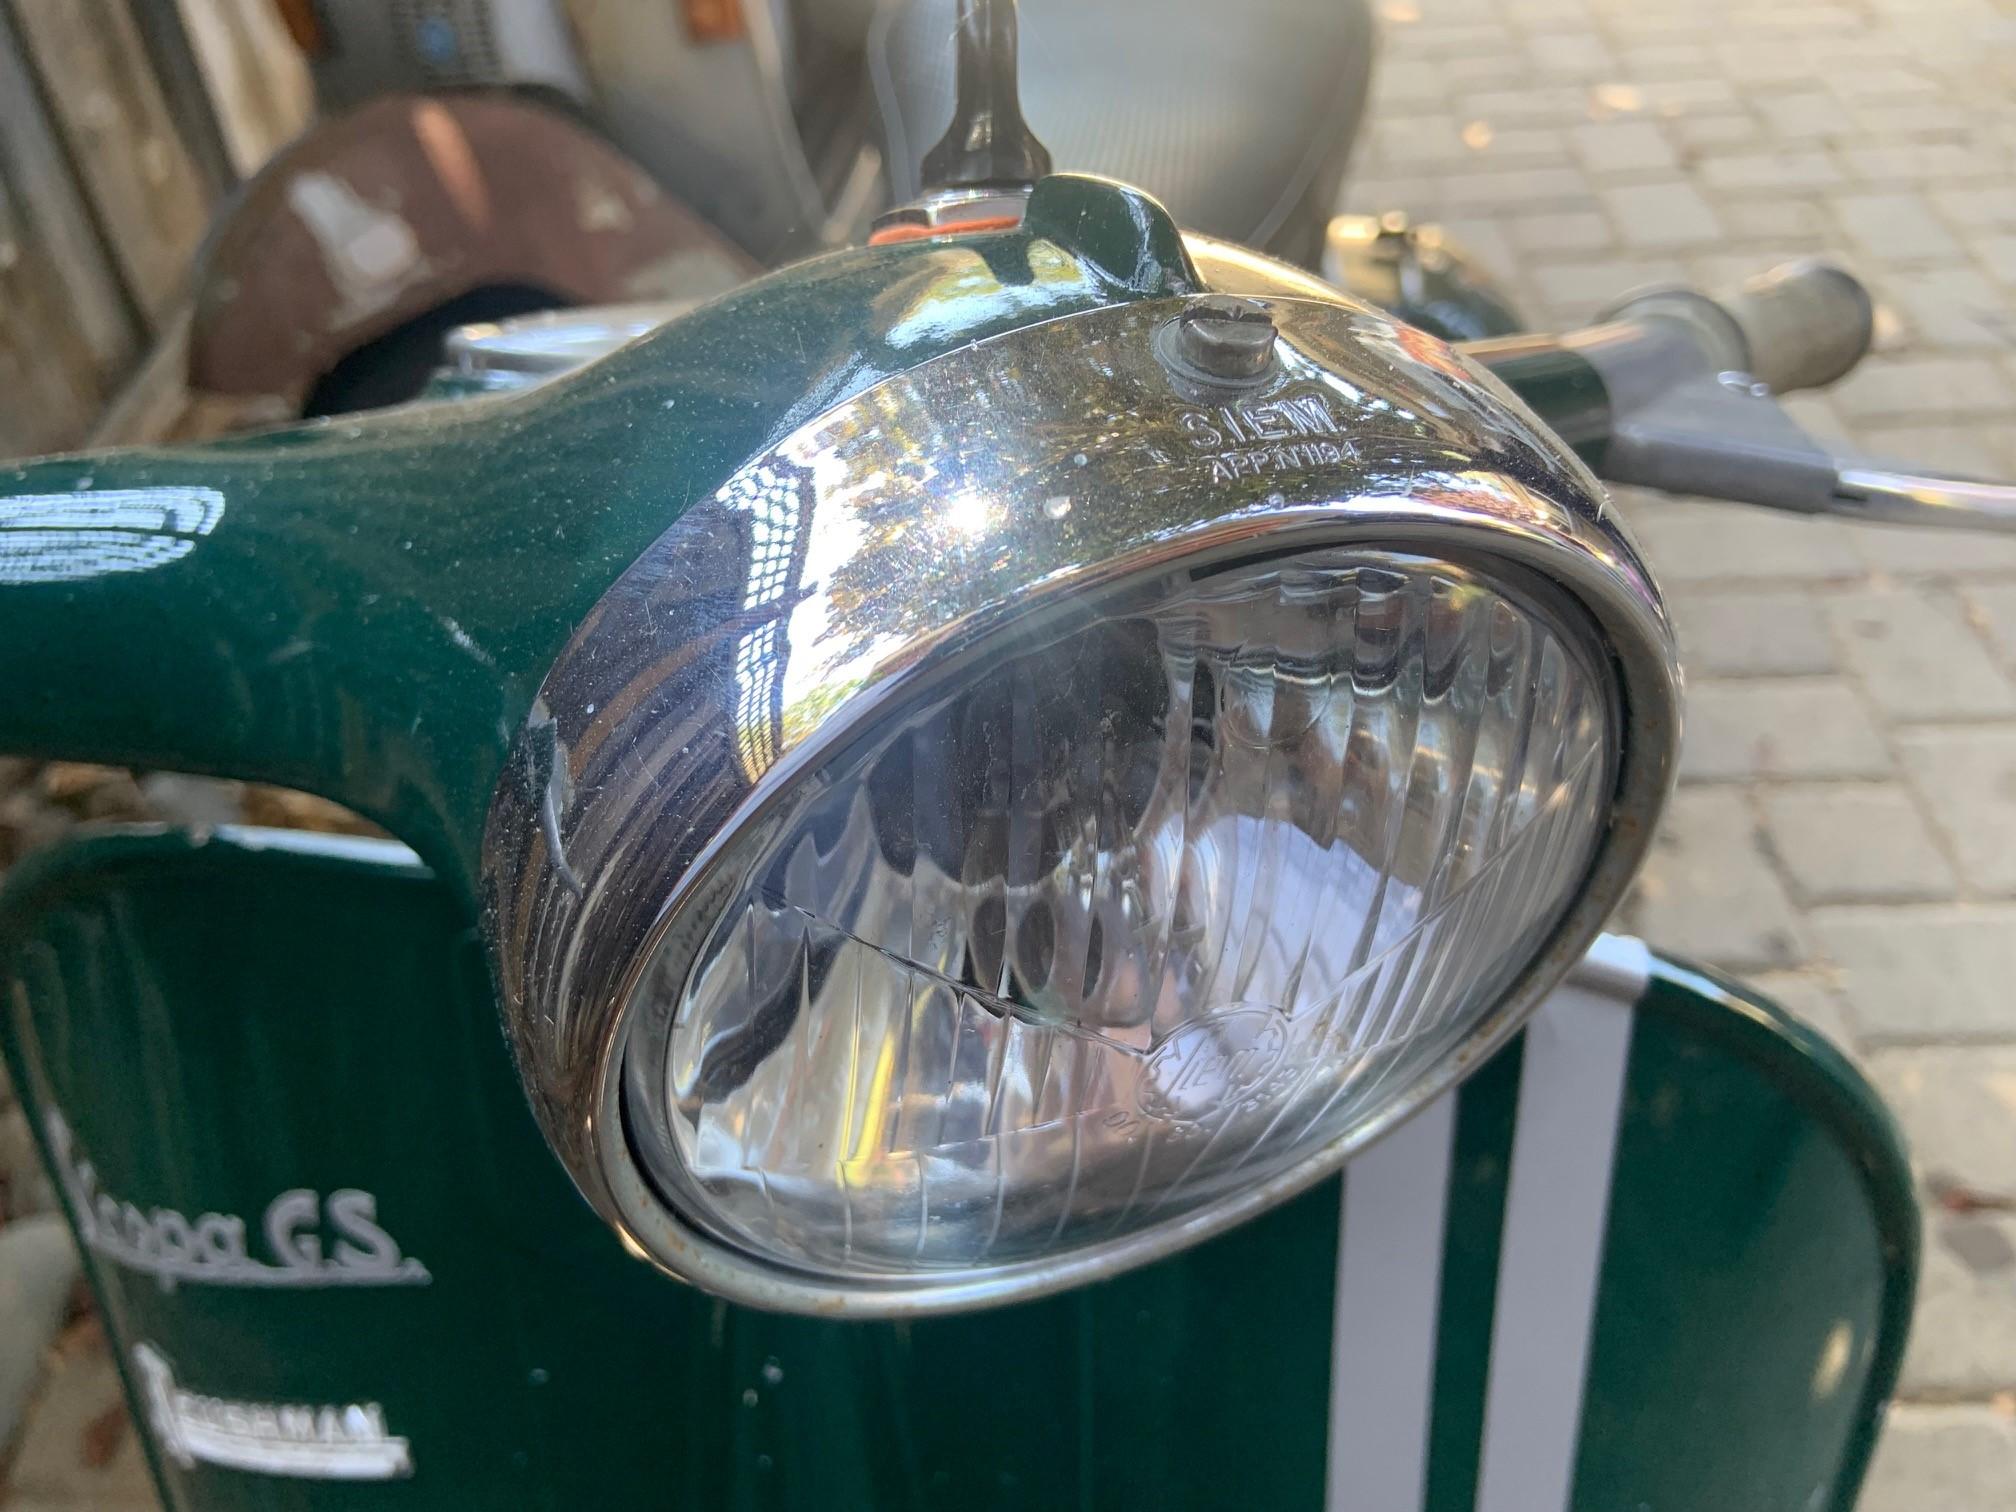 Josh Rogers - 1961 Cushman GS - headlight